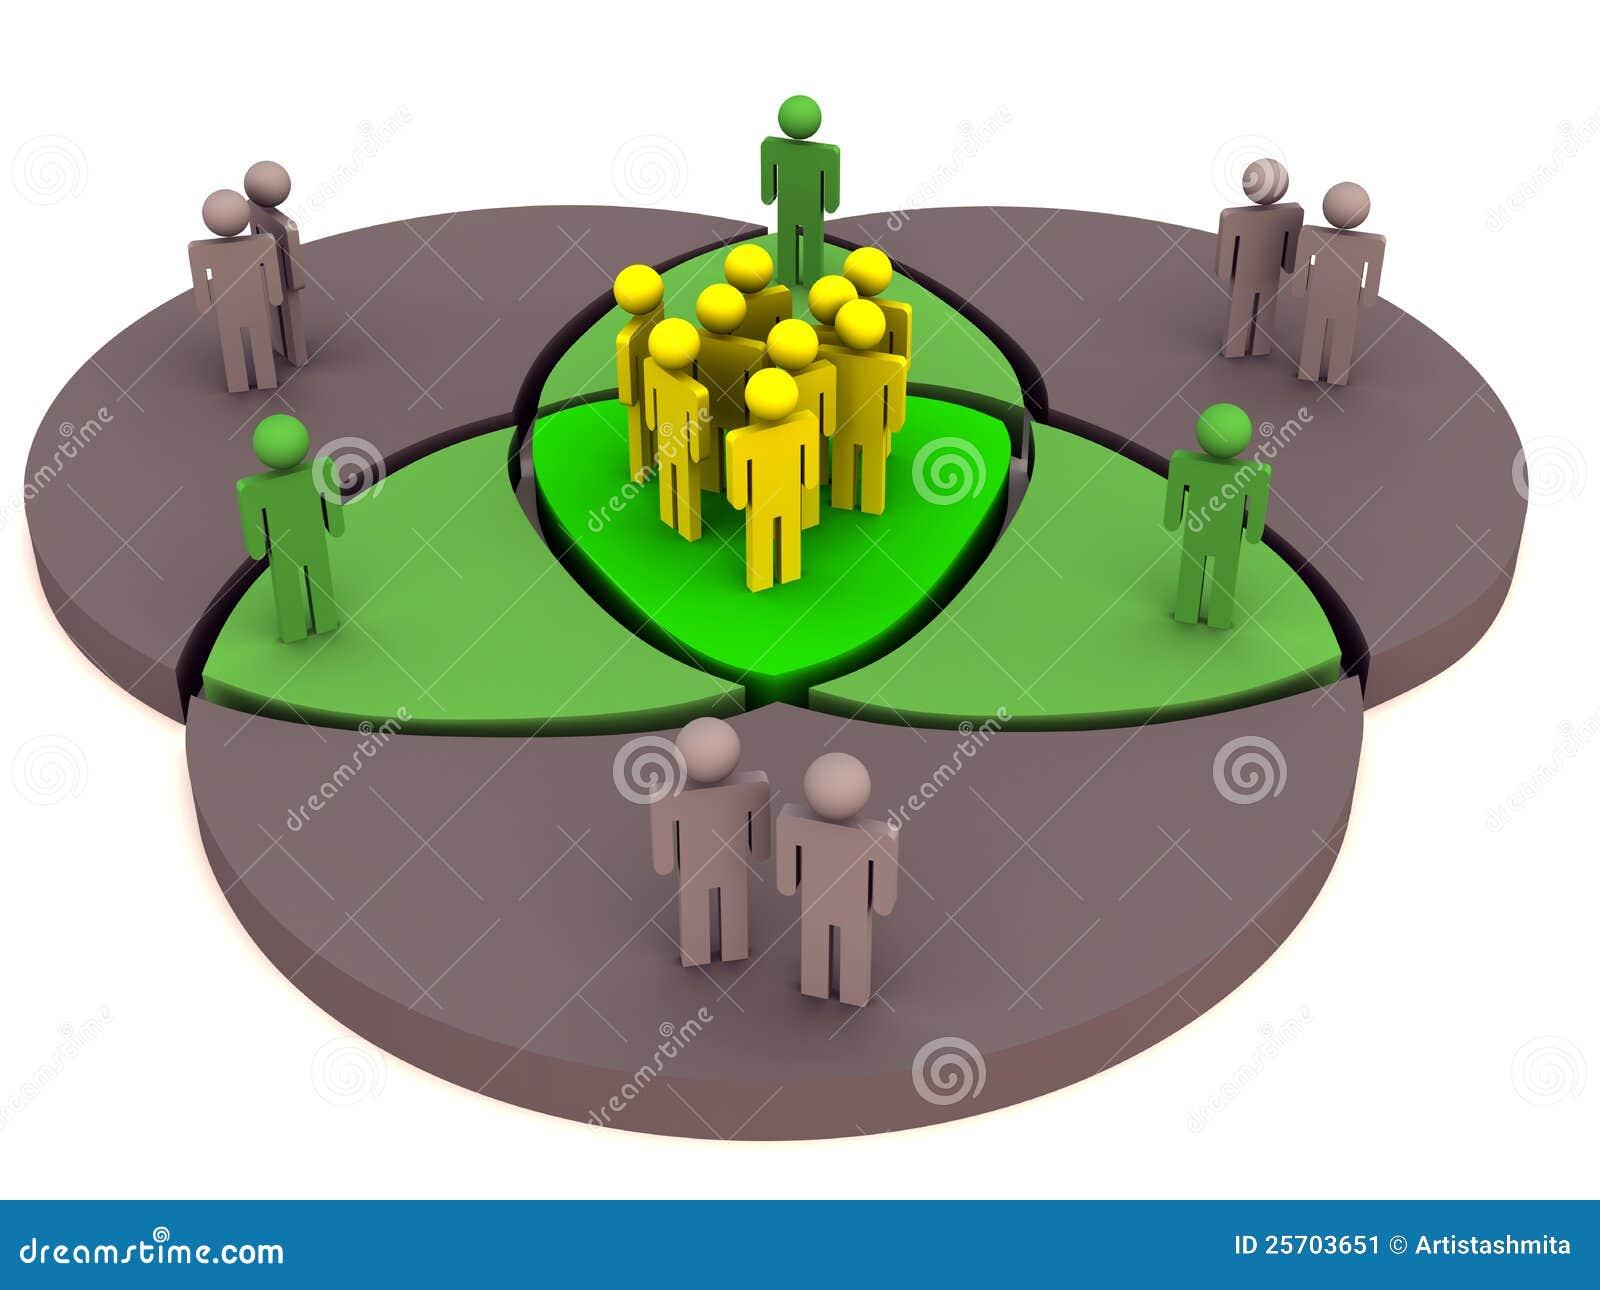 Community Venn Diagram Stock Image - Image: 25703651